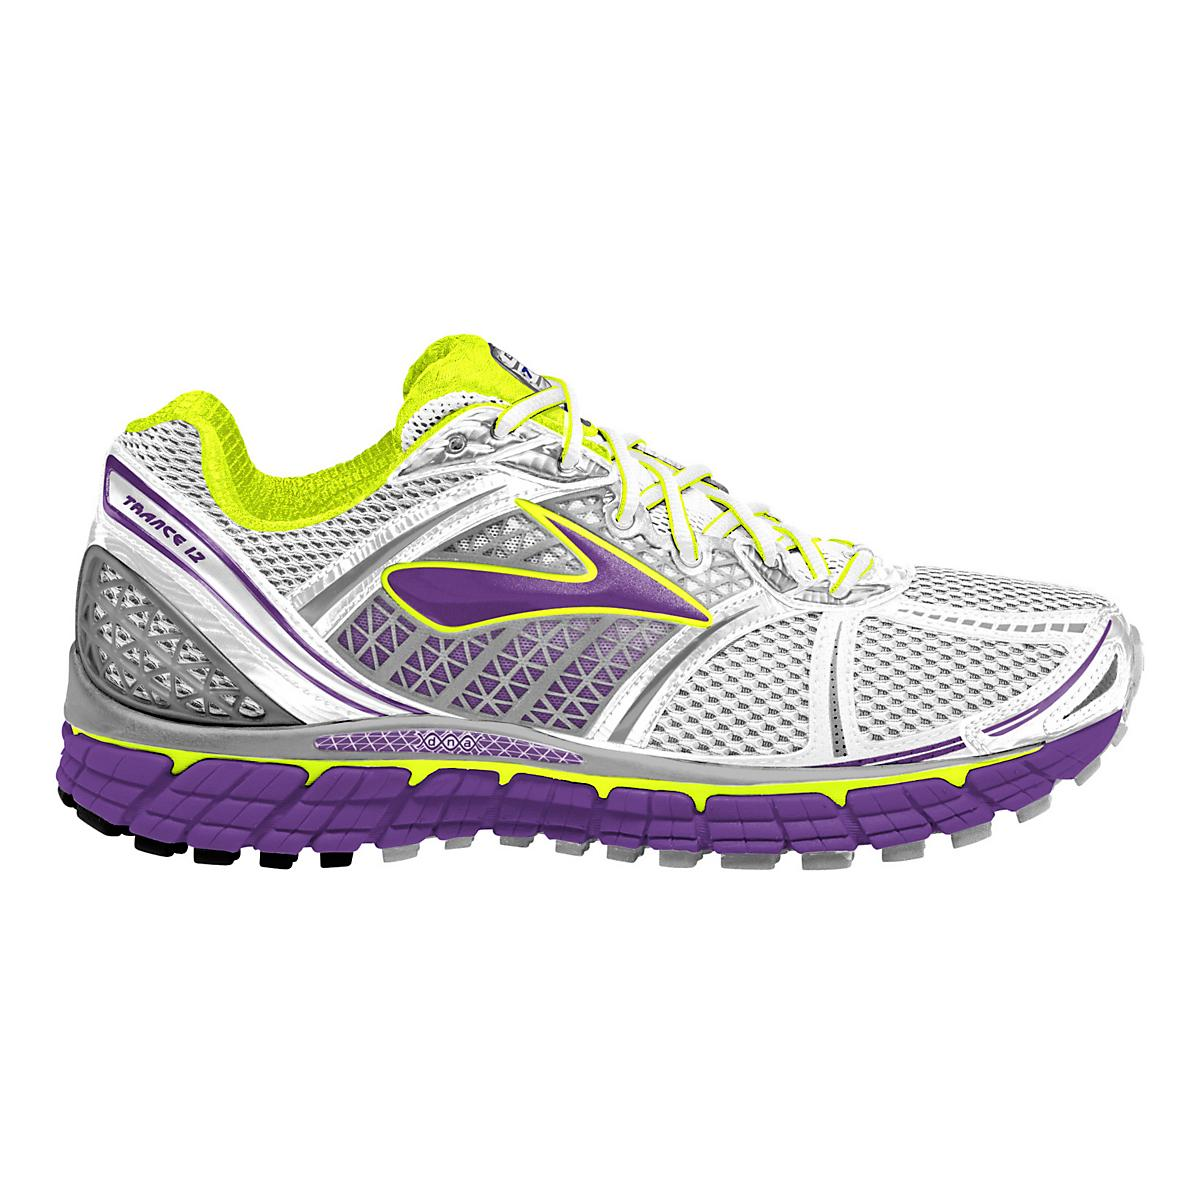 66beaf66964 Womens Brooks Trance 12 Running Shoe at Road Runner Sports